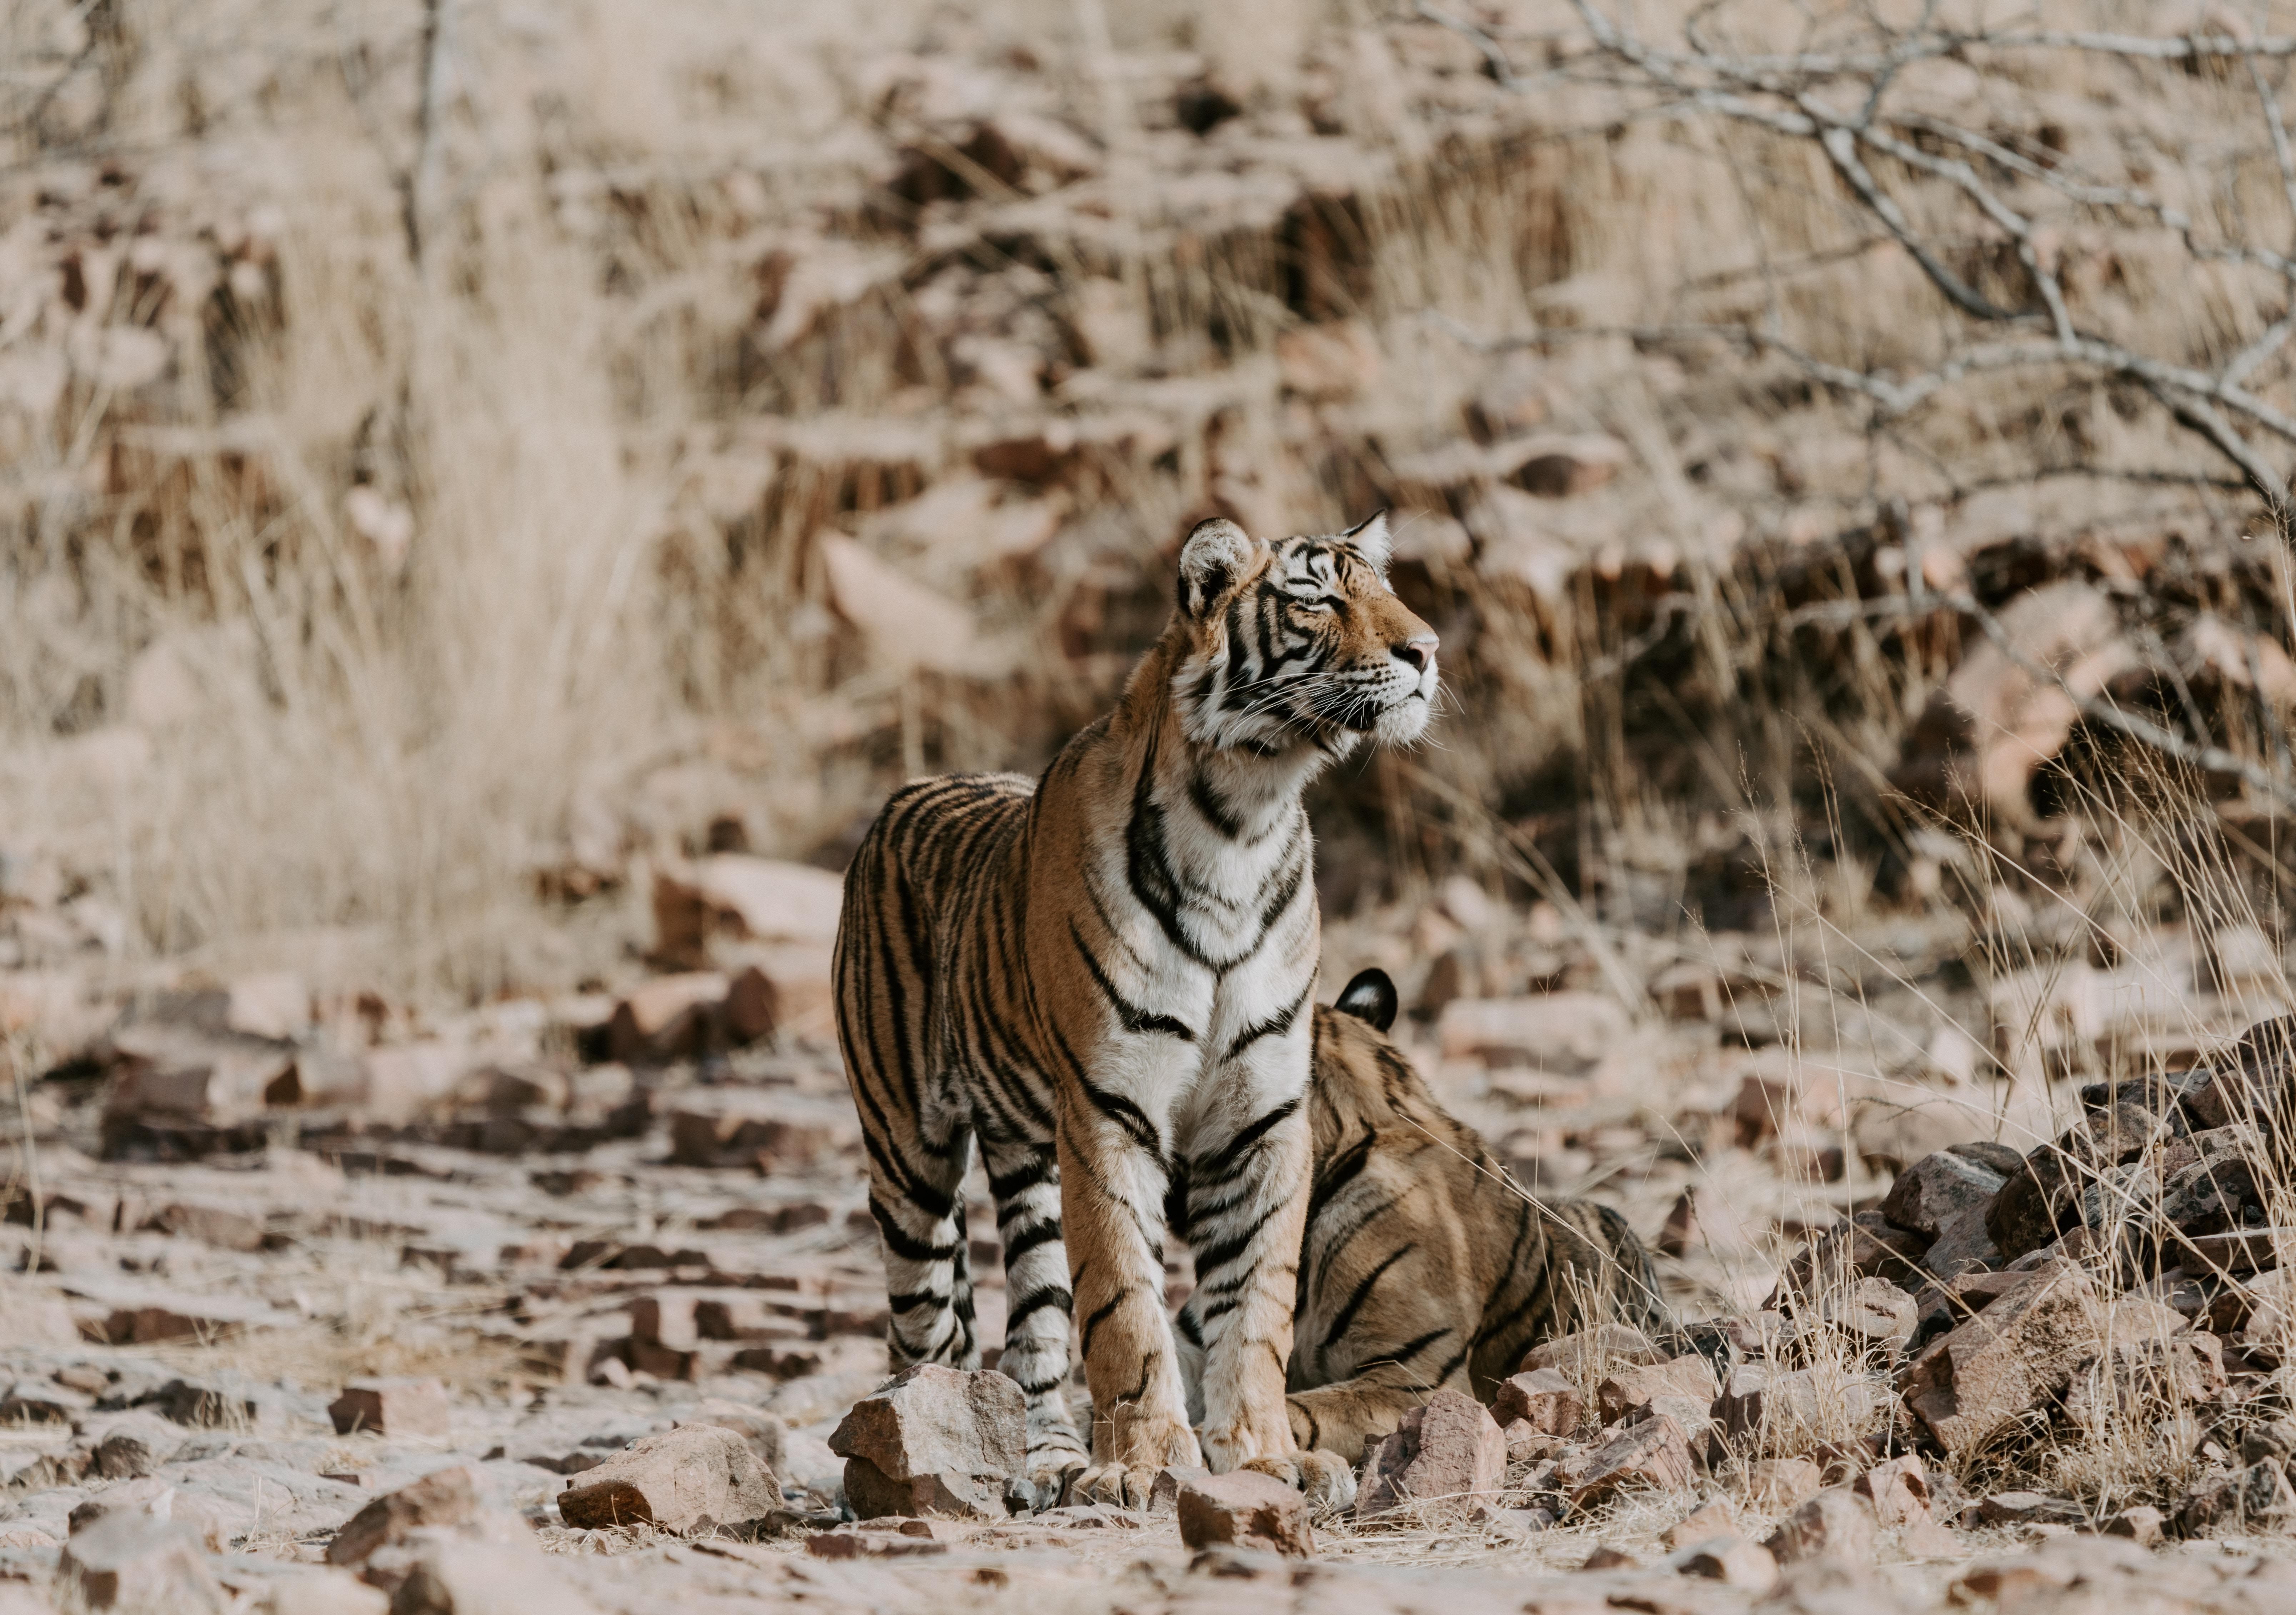 World Animal Day: Working to Keep Wildlife Wild!